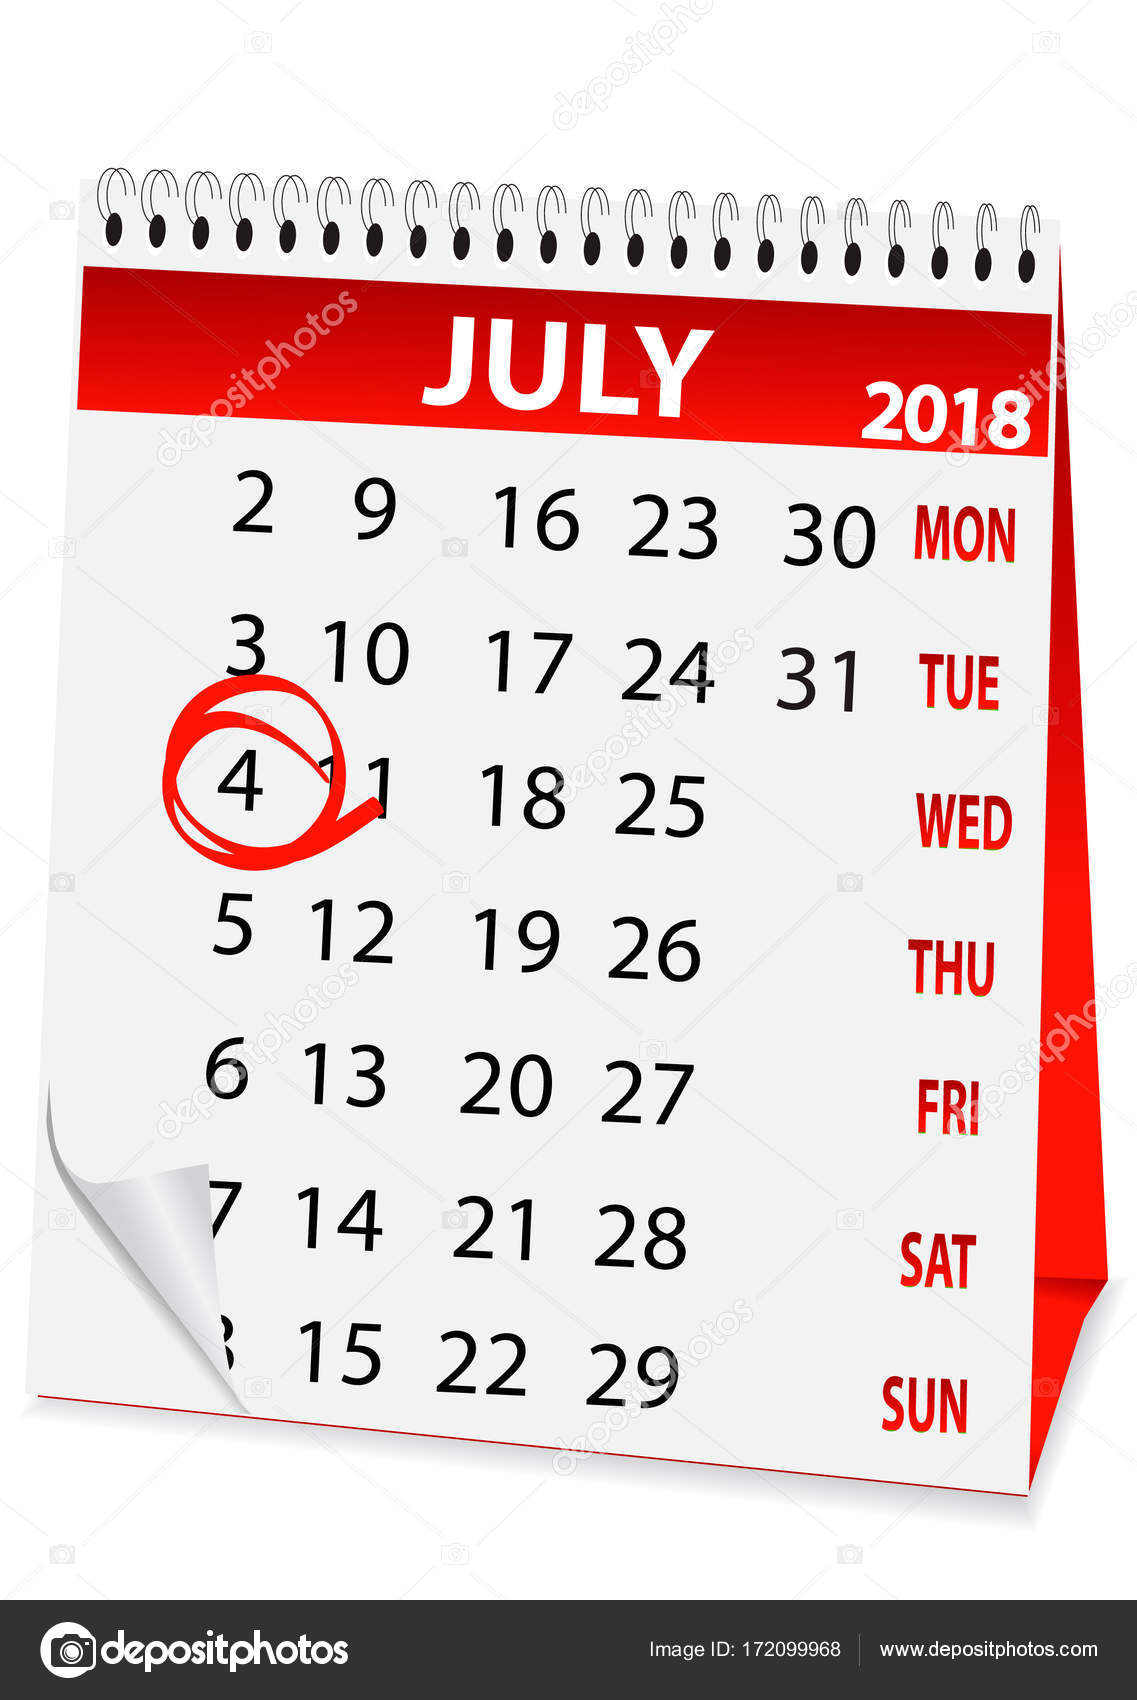 symbol kalender f r 4 juli 2018 stockvektor rodakm. Black Bedroom Furniture Sets. Home Design Ideas